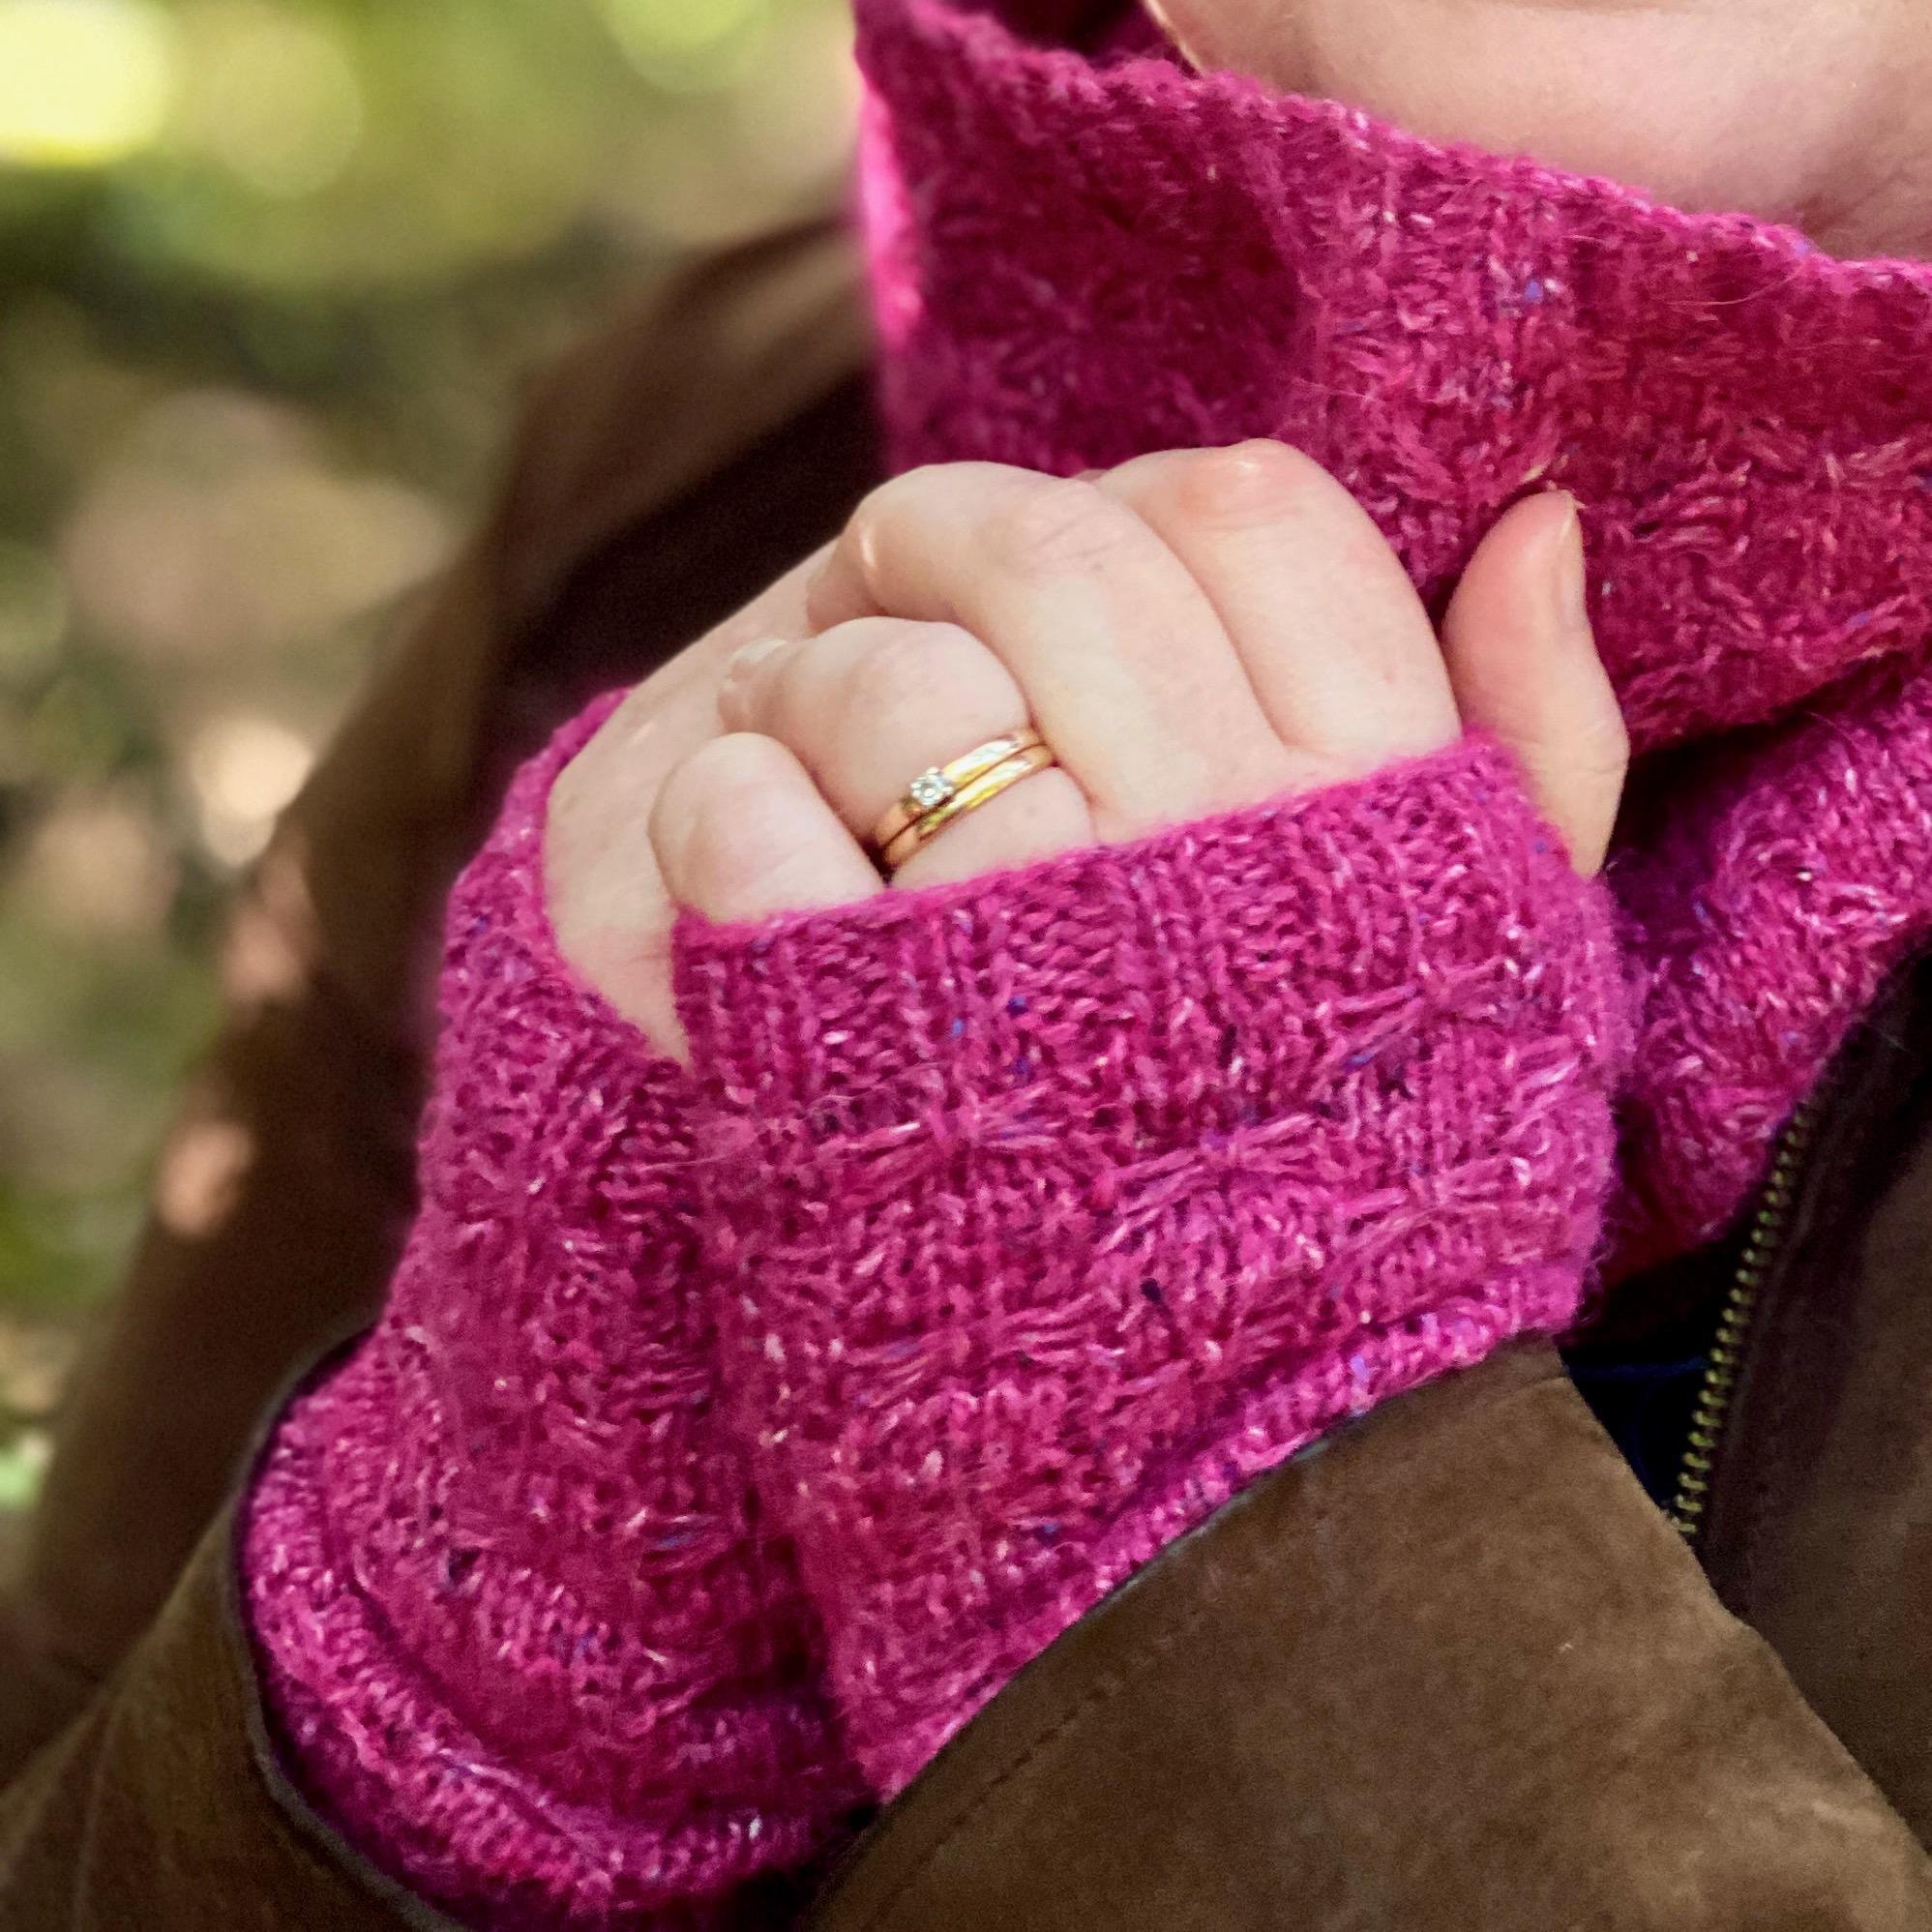 Hands wearing pink cuffs, holding cowl near face